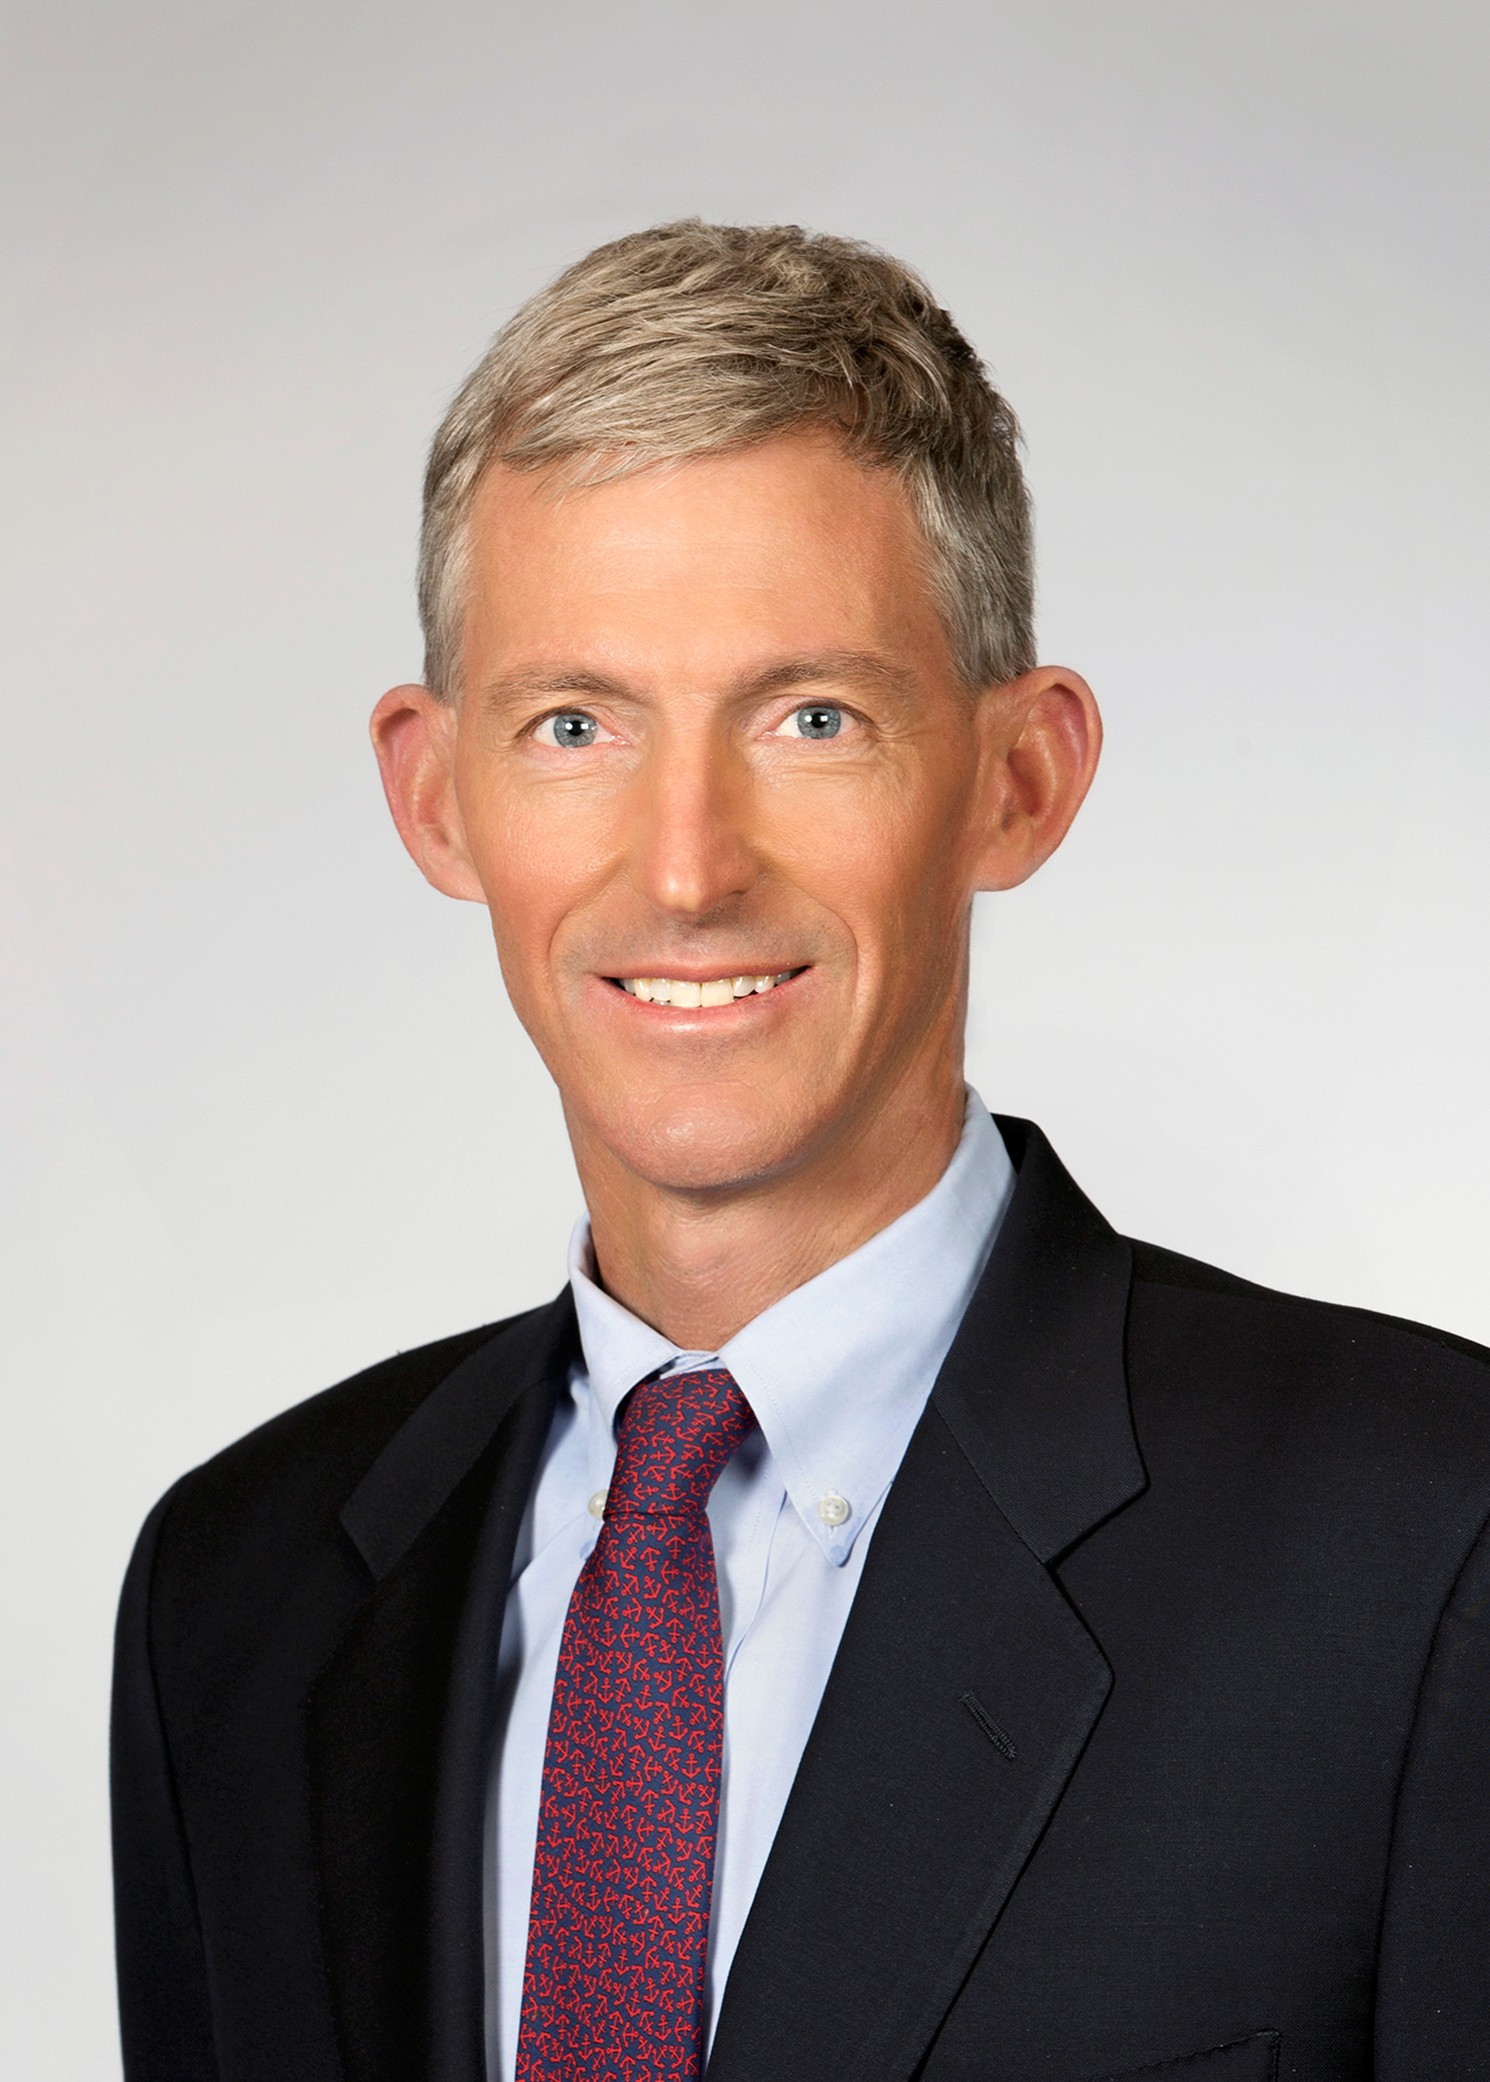 Brian G. Sweeney (Photo: Business Wire)